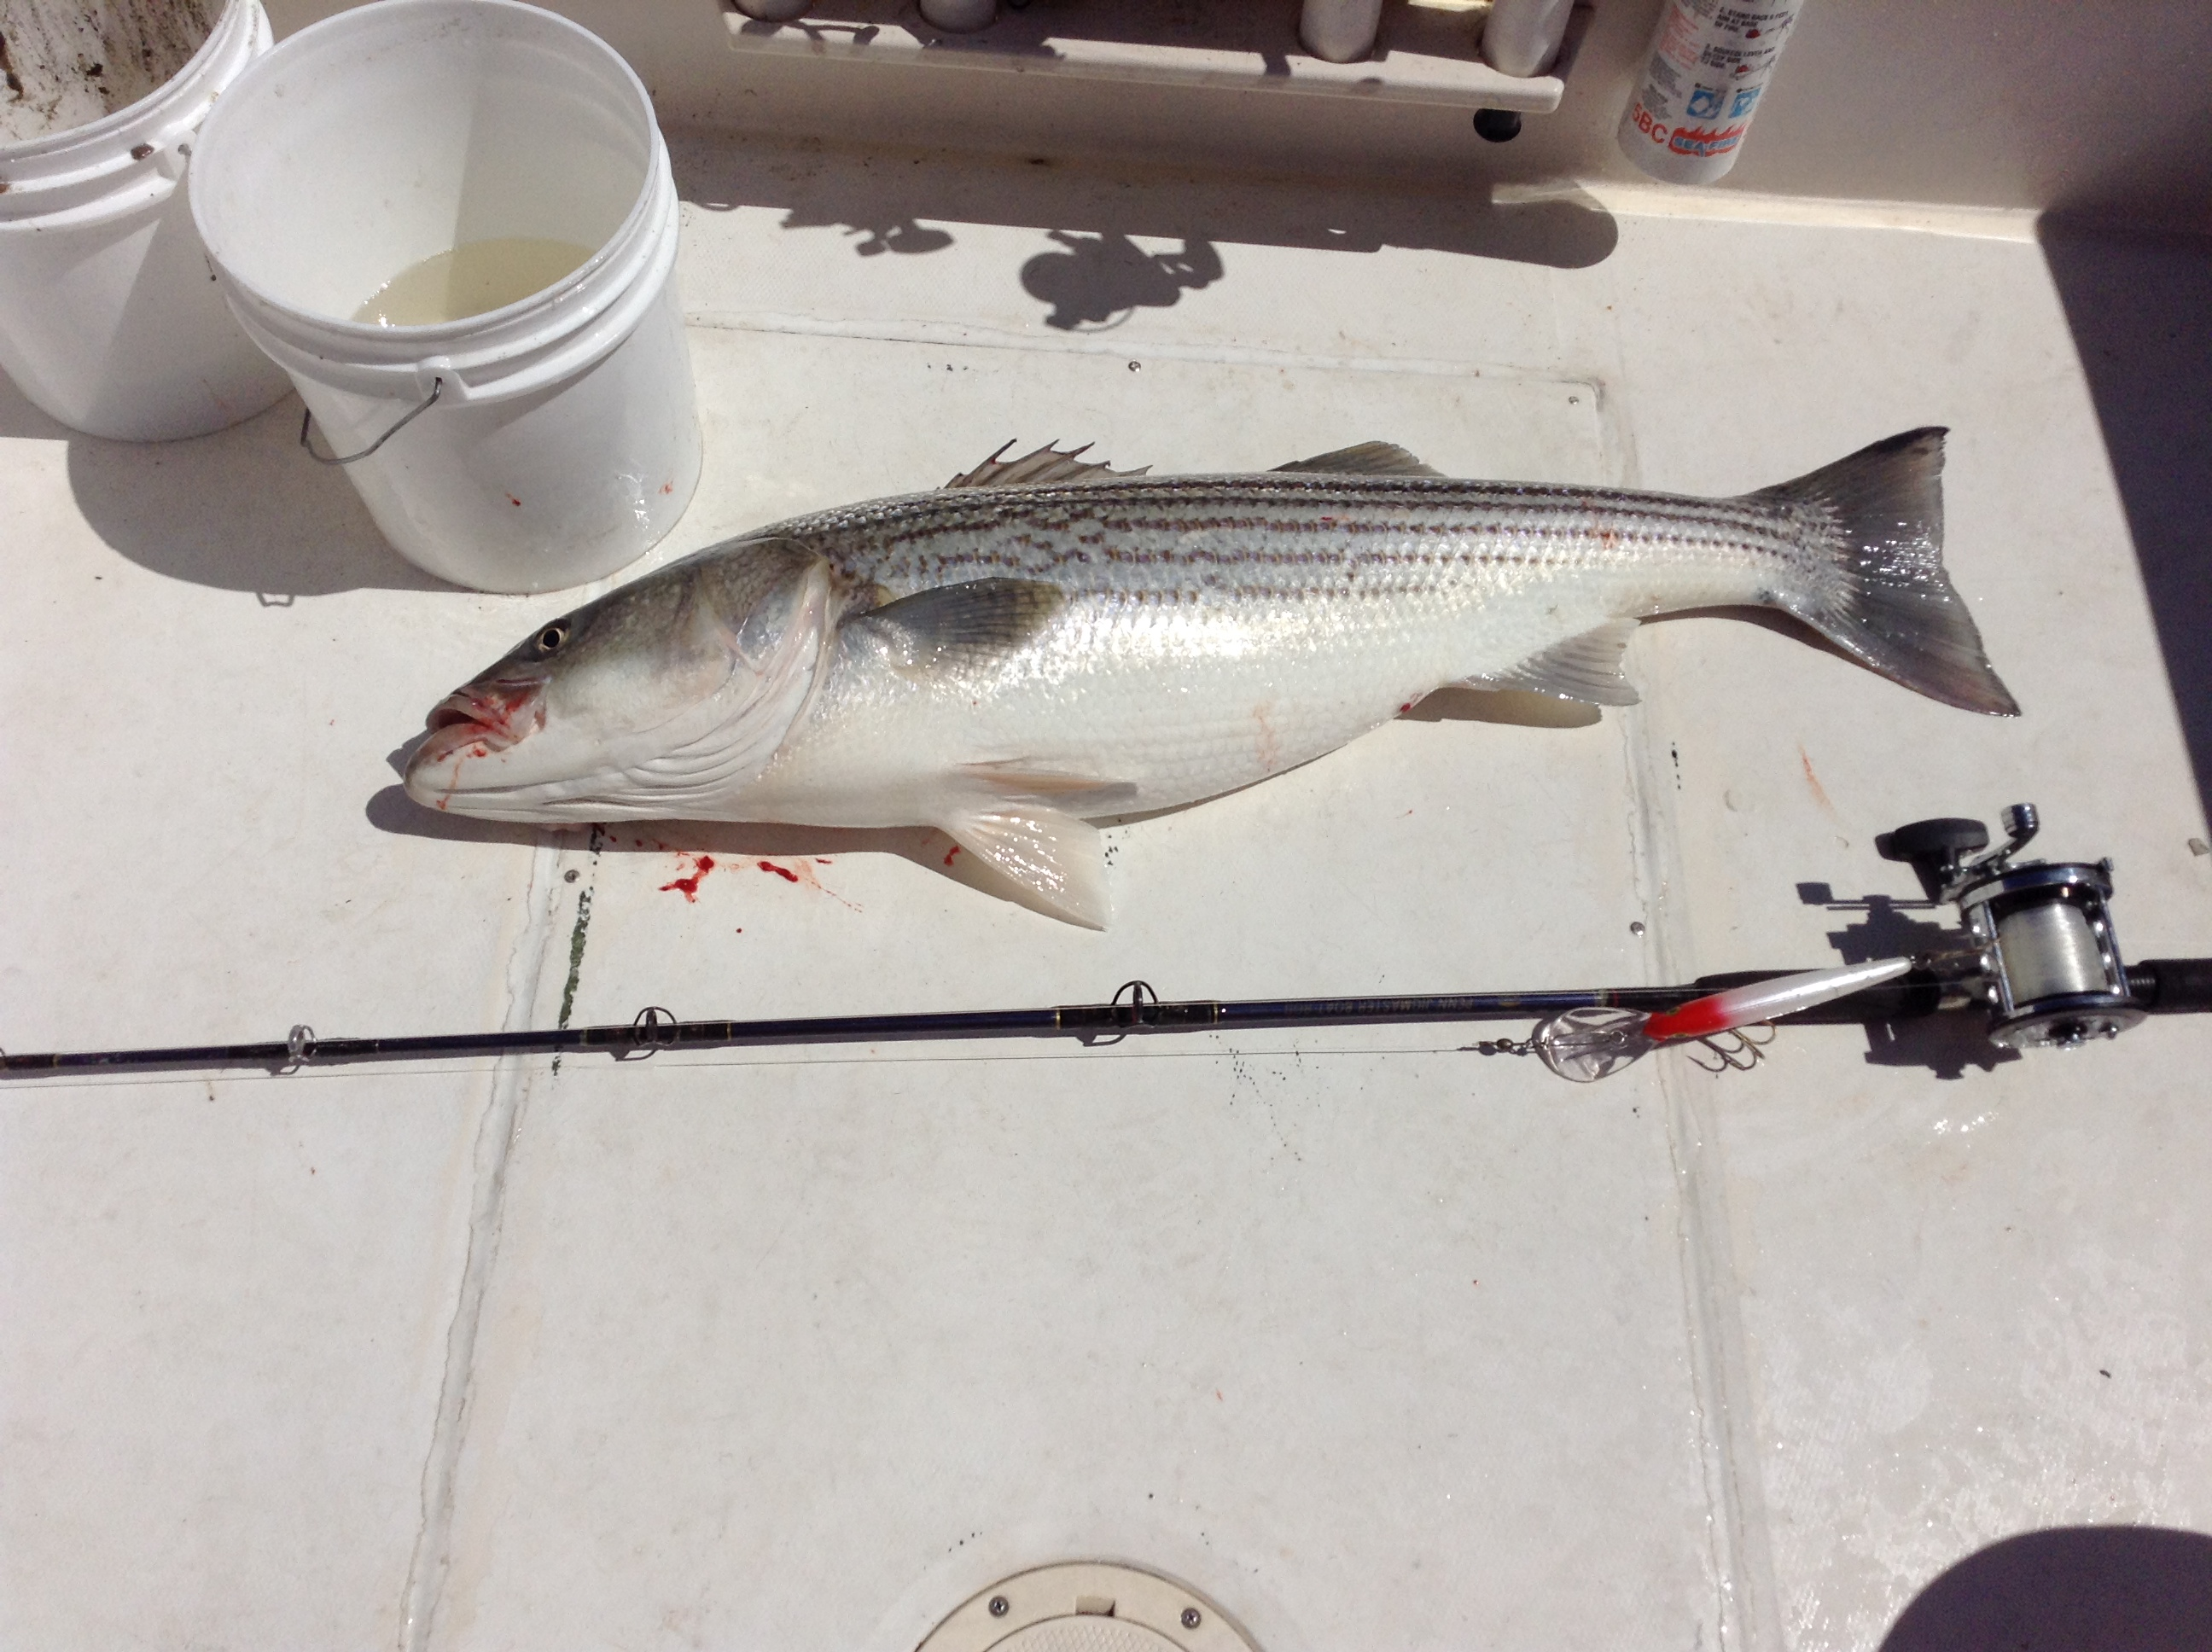 Atlantic highlands fishing report hot bass fishing in for Atlantic highlands fishing report